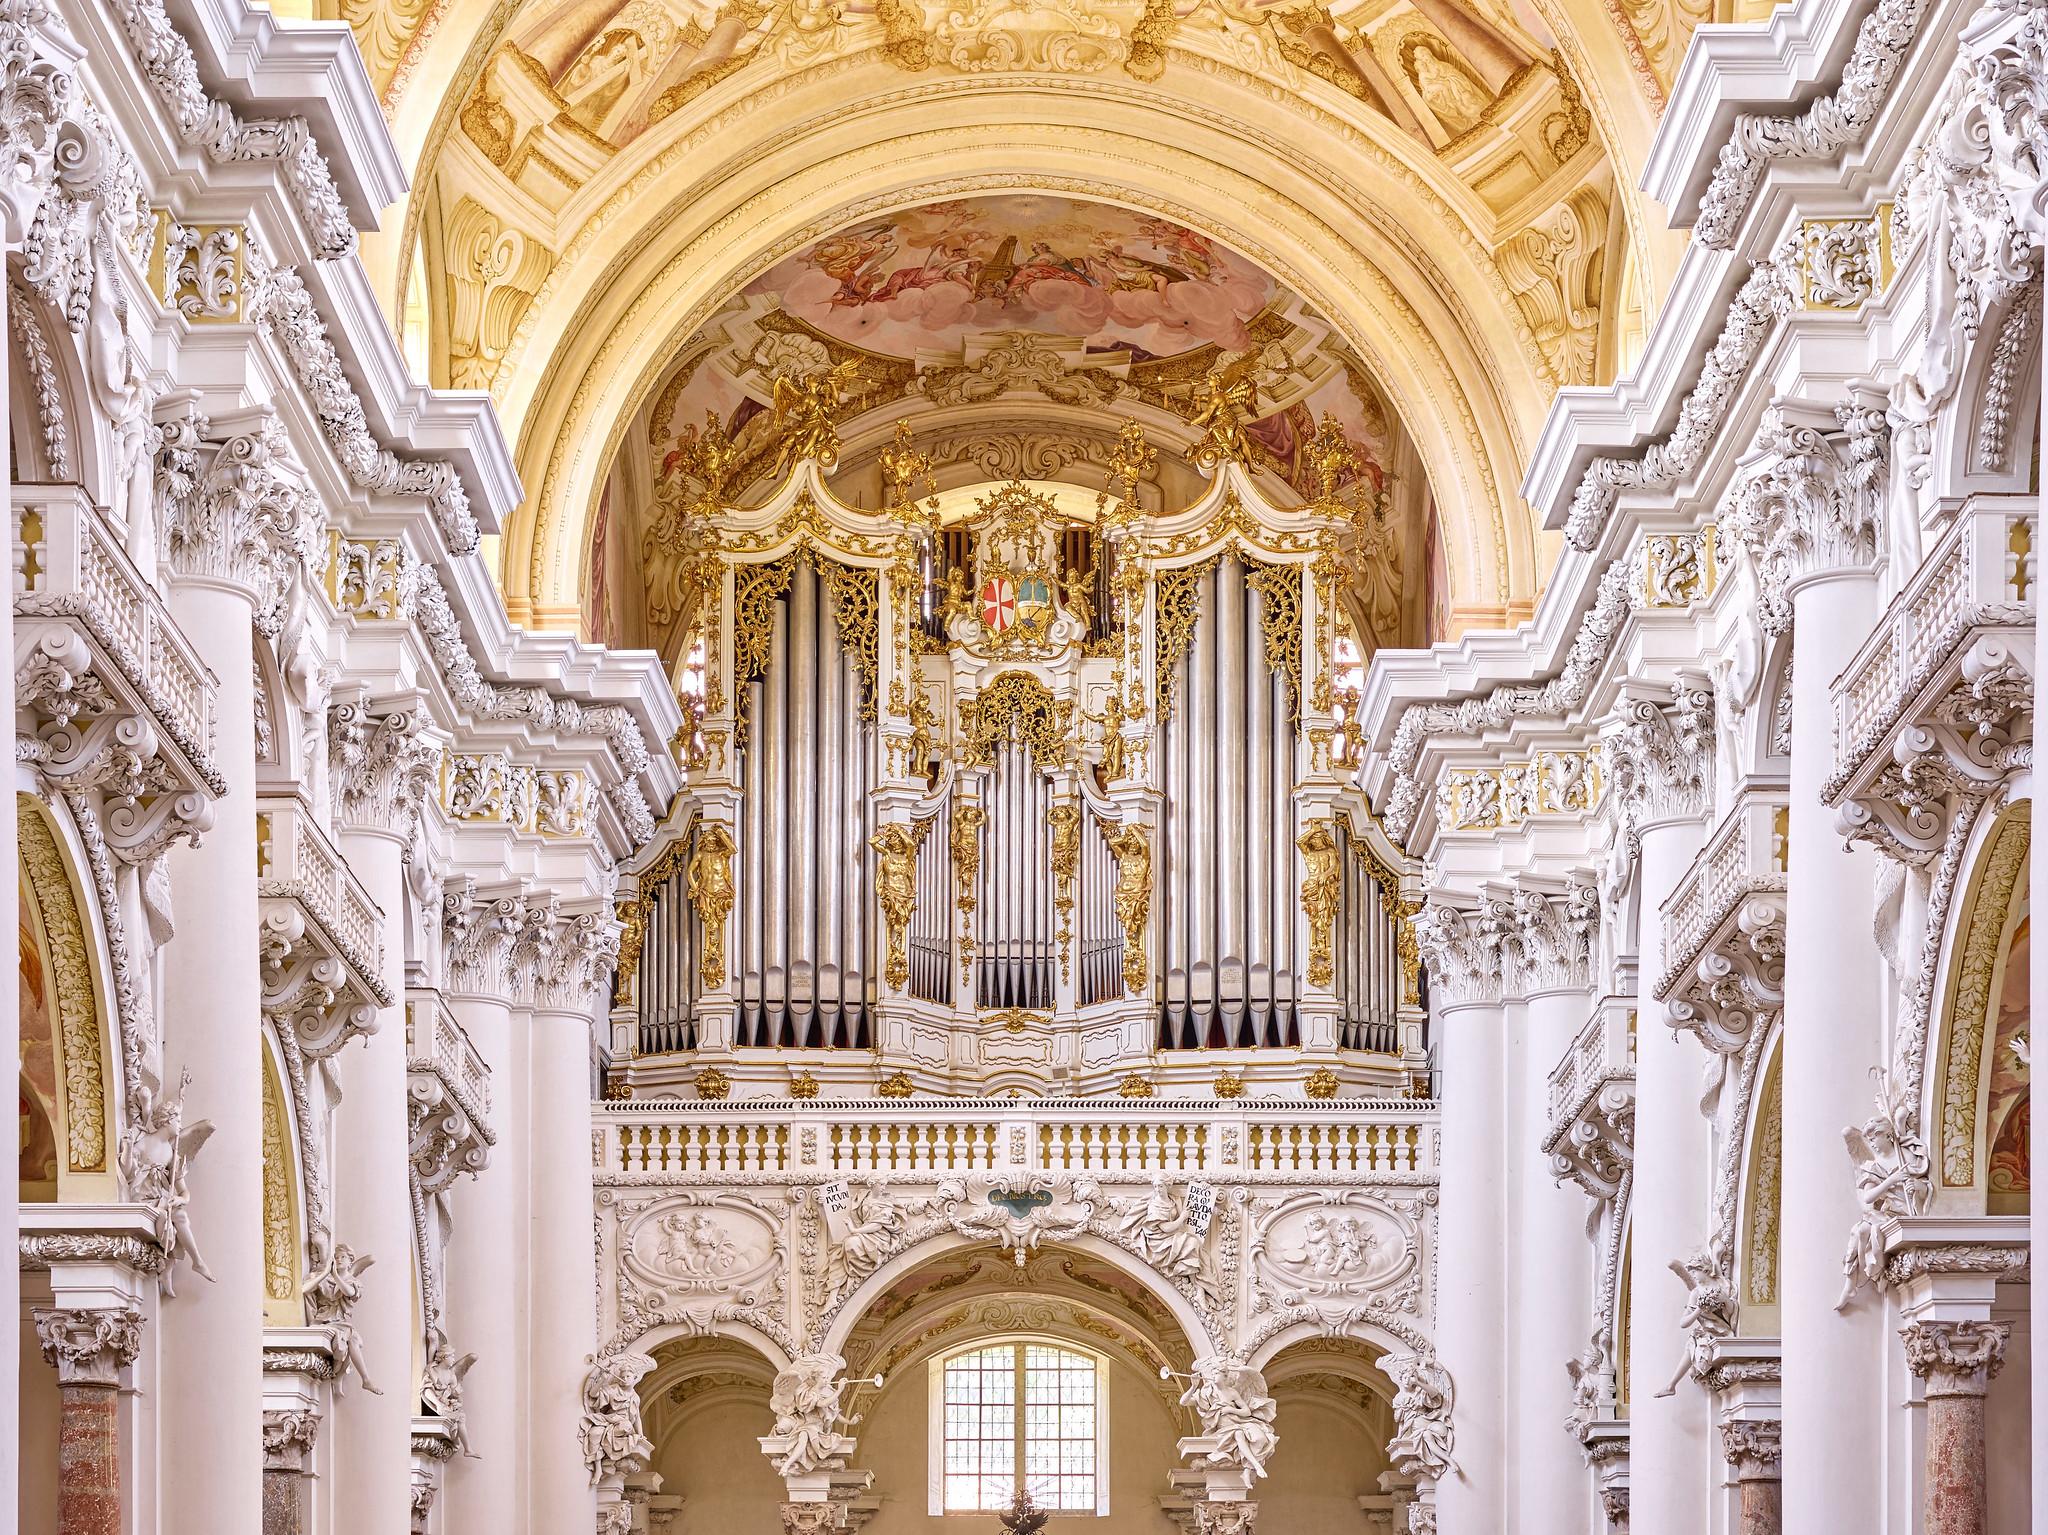 Brucknerorgel Stift St. Florian / Fotocredit: Pedagrafie